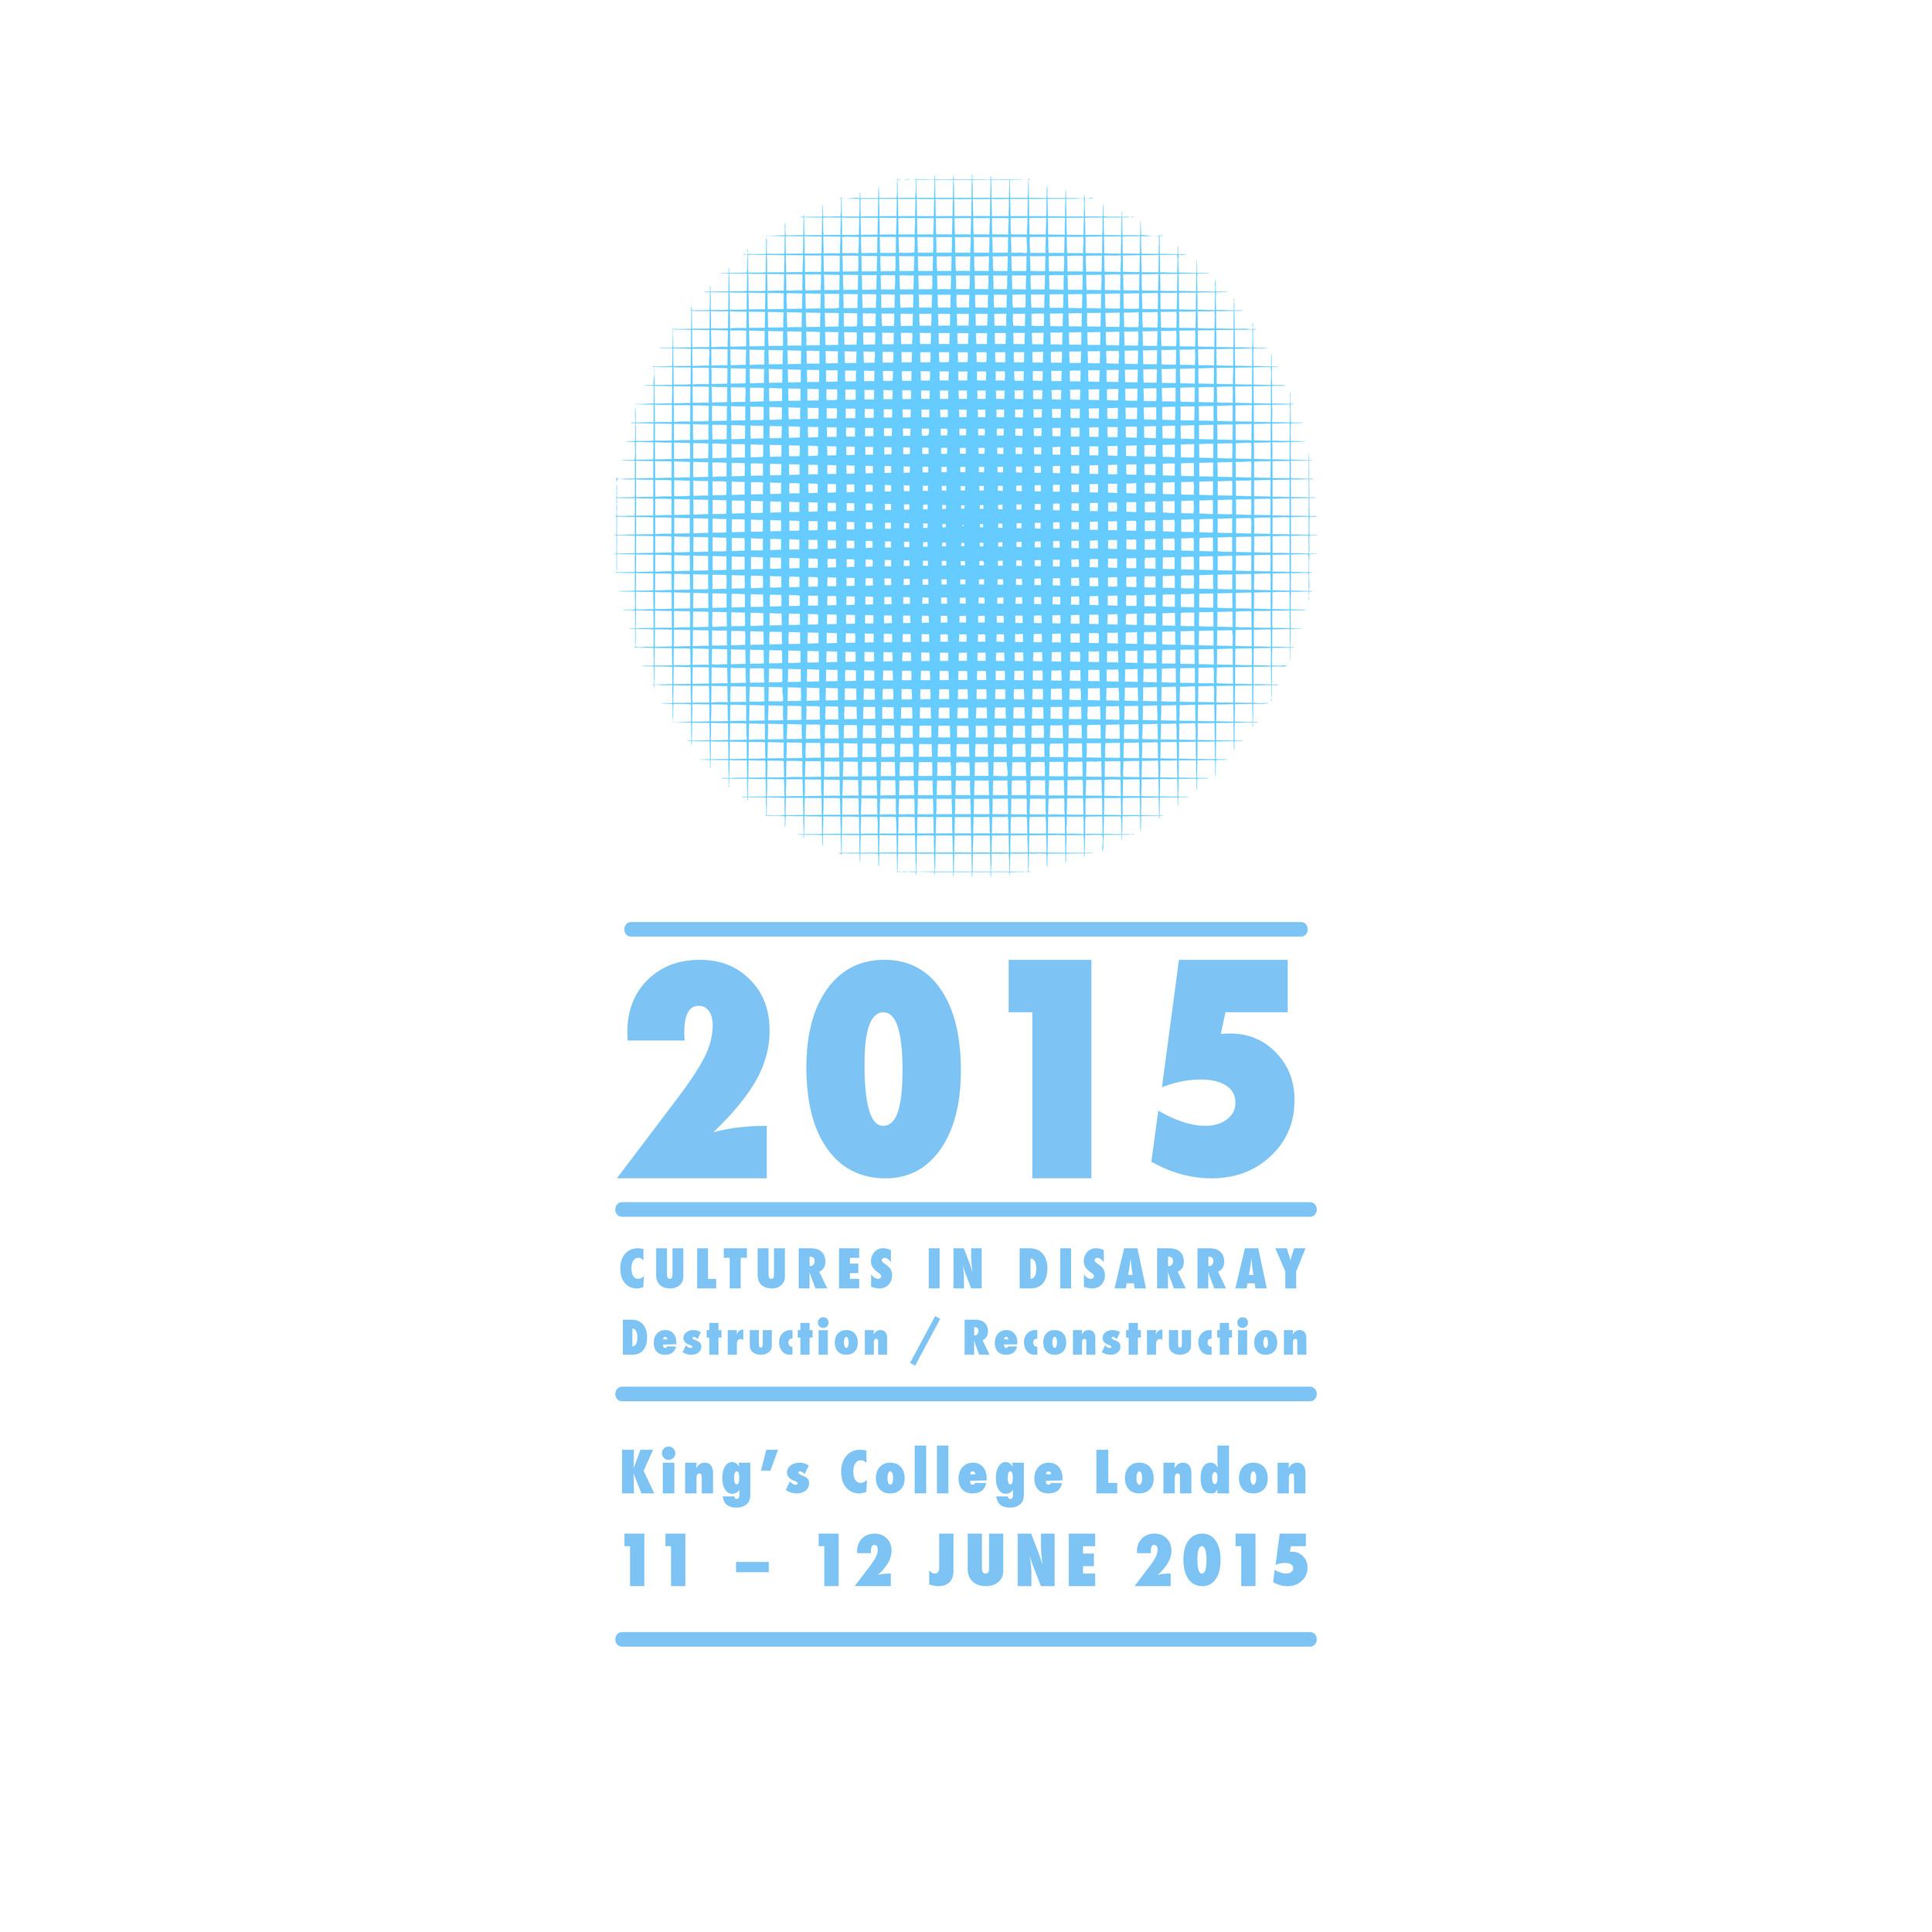 KCL 2015-01.jpg